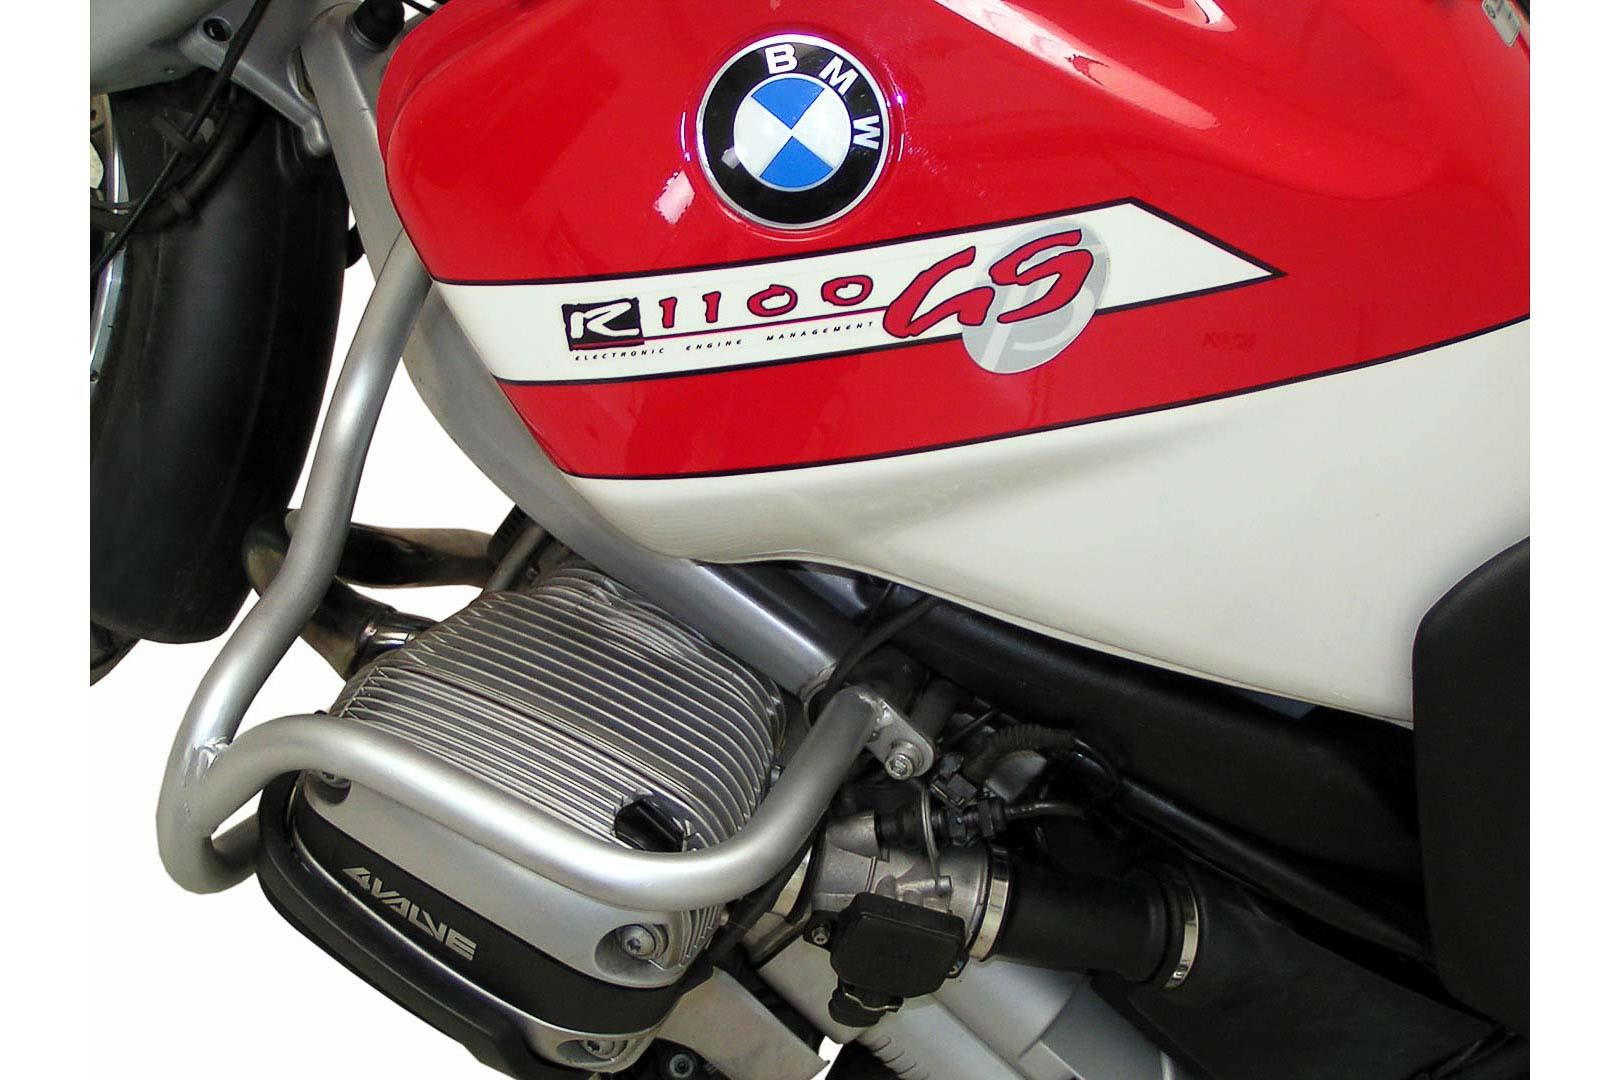 SW-Motech Moottorinsuojarauta BMW R1100GS hopea